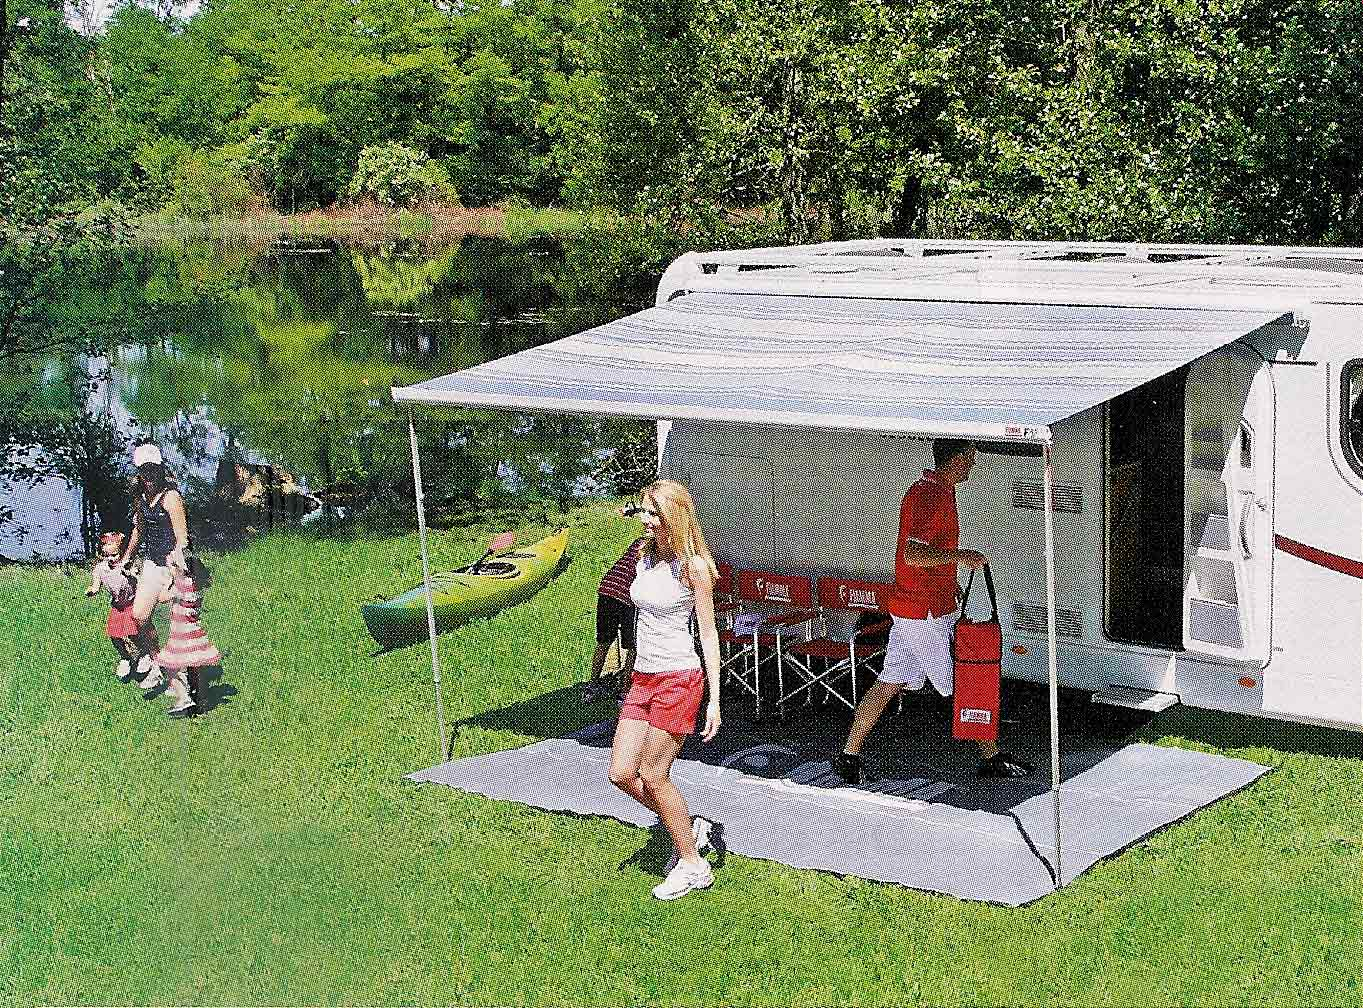 CAMPING MADULAIN Accessories For Camper Motorhomes Caravan Liquidation List